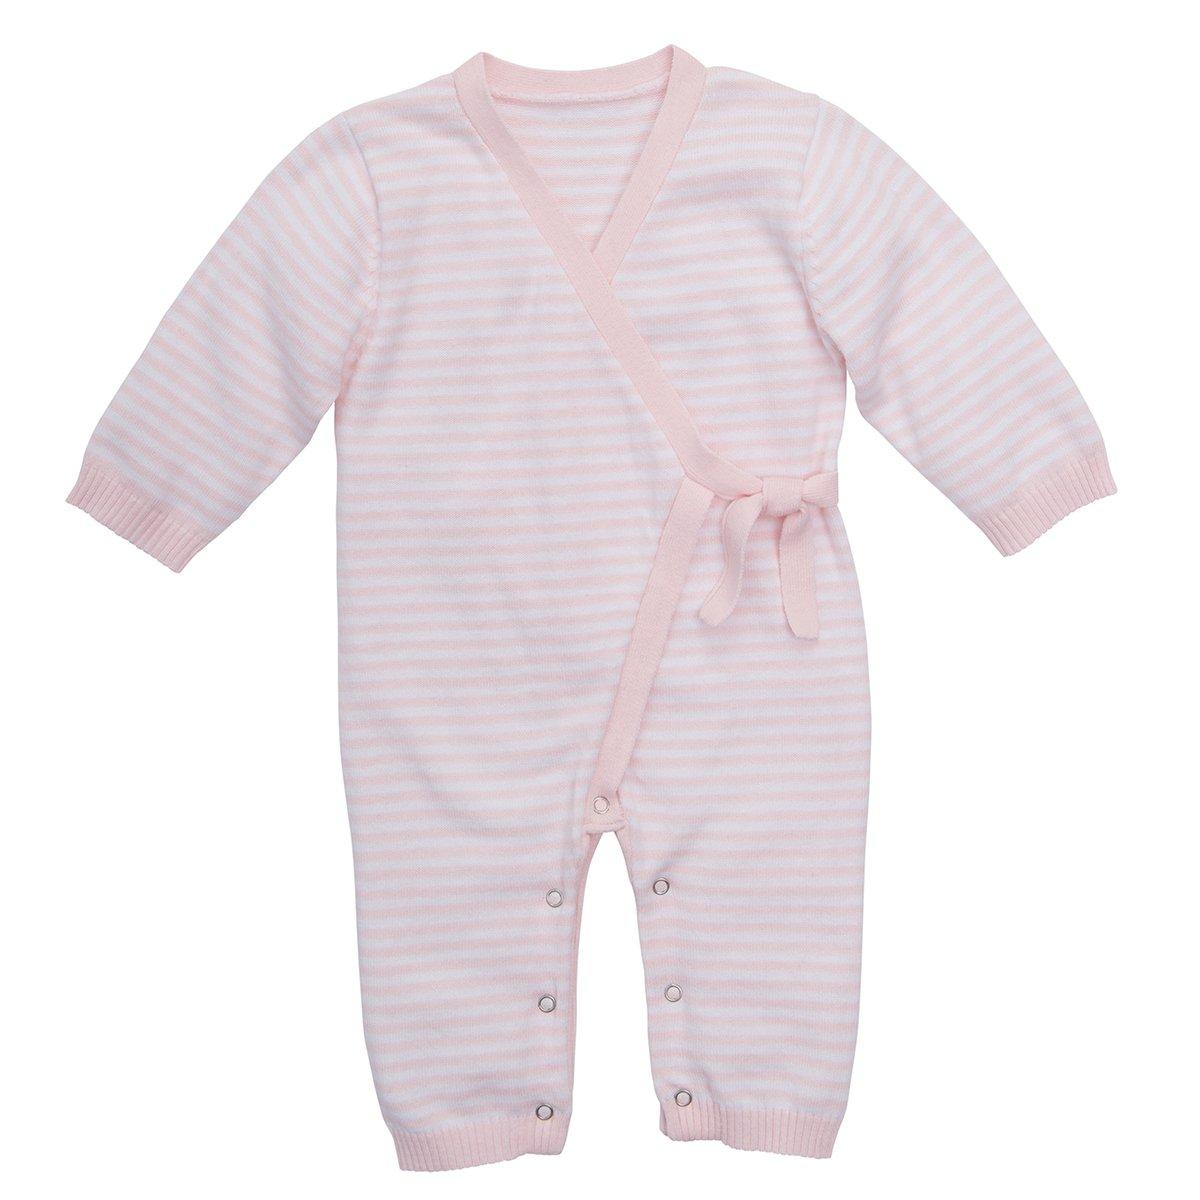 26c8452b2261 Amazon.com  Elegant Baby Unisex Stripe Knit Jumpsuit